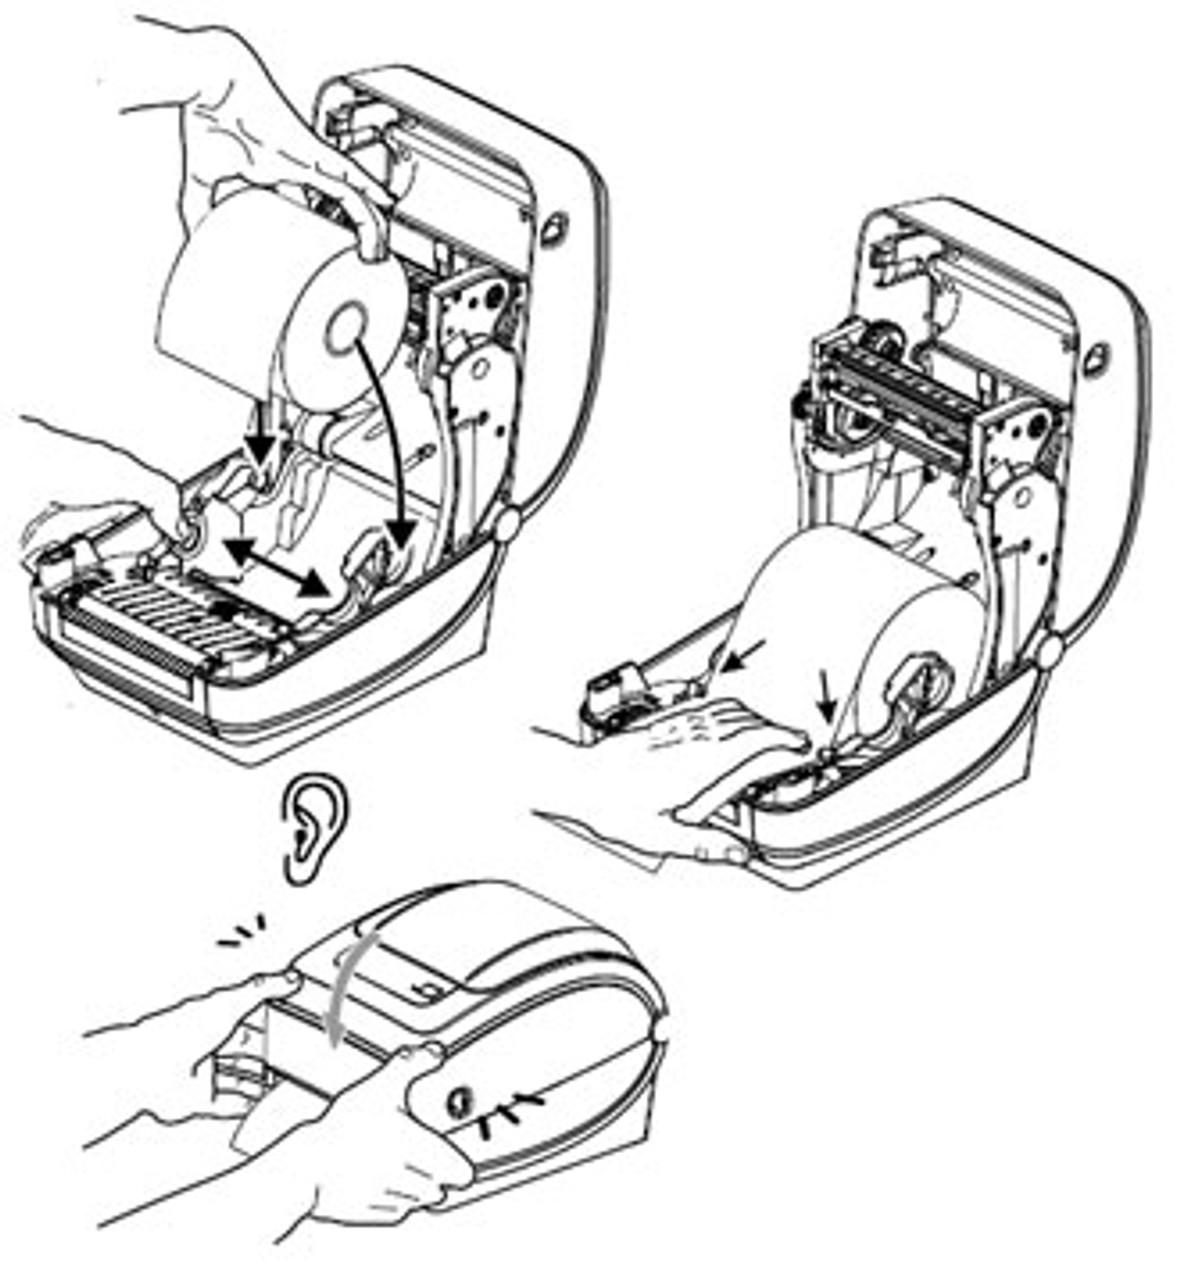 110Xi4Drivers - Firmware - Manuals